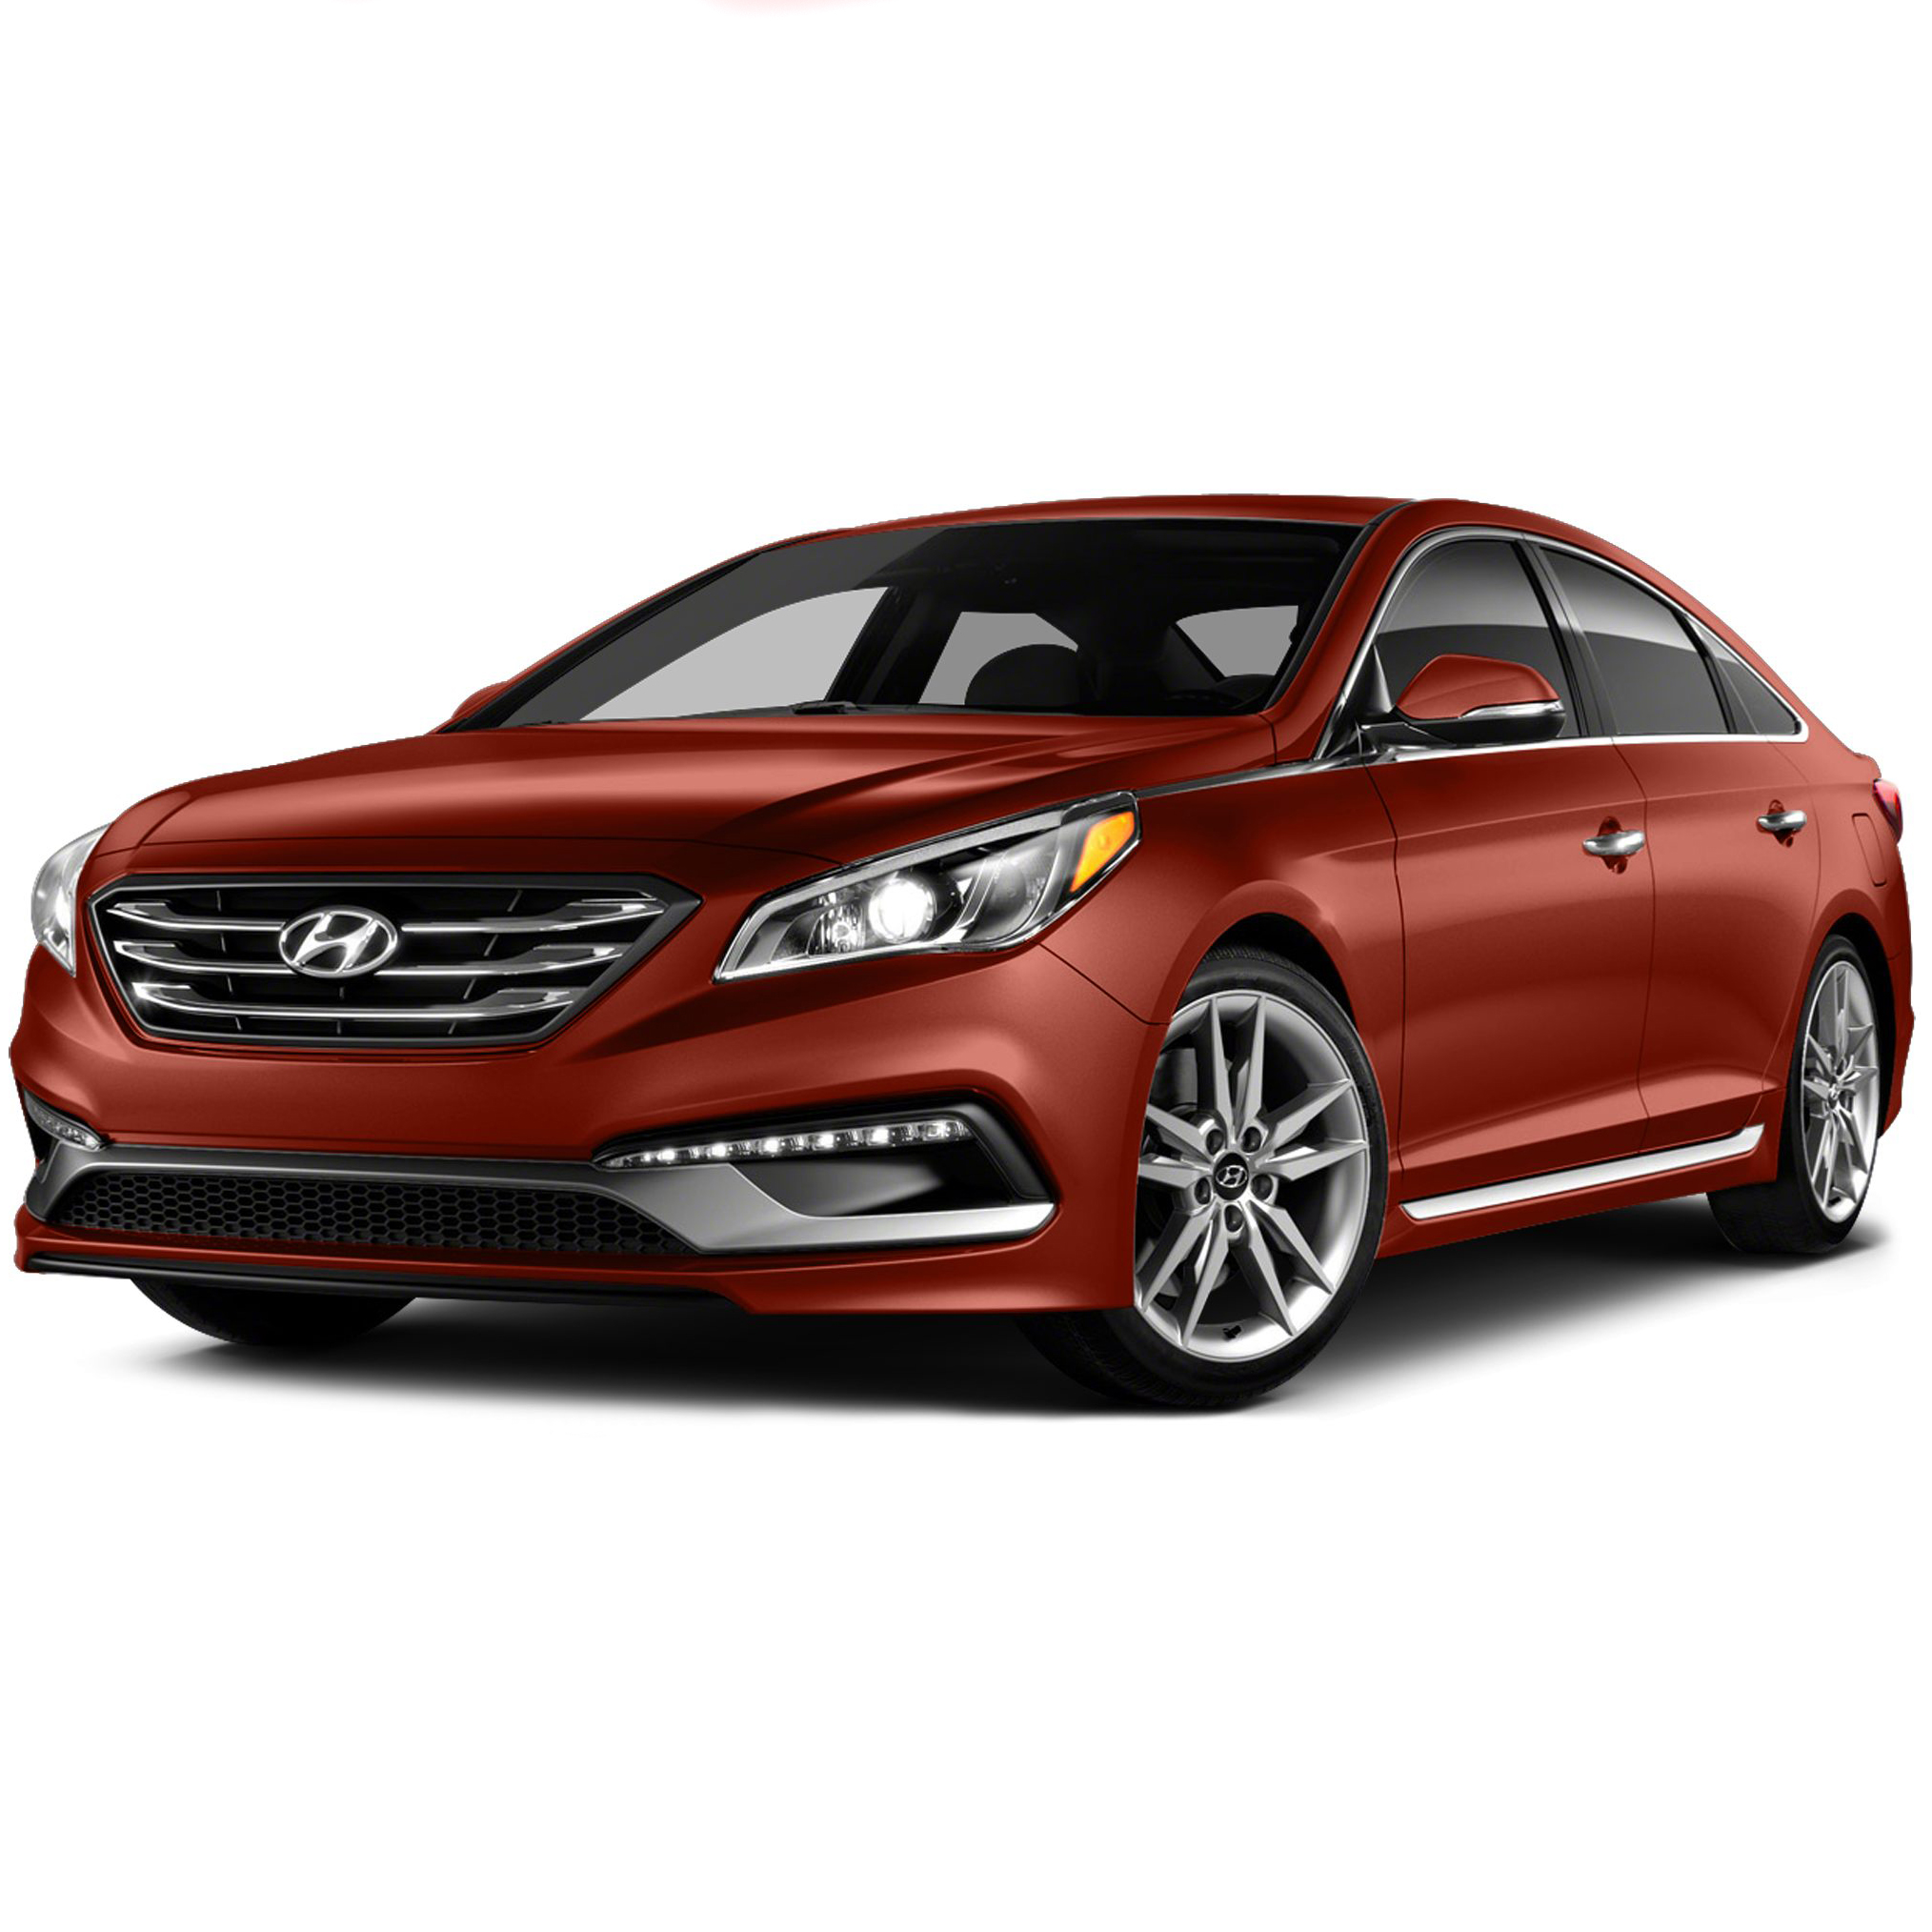 Hyundai Sonata Car Mats (All Models)